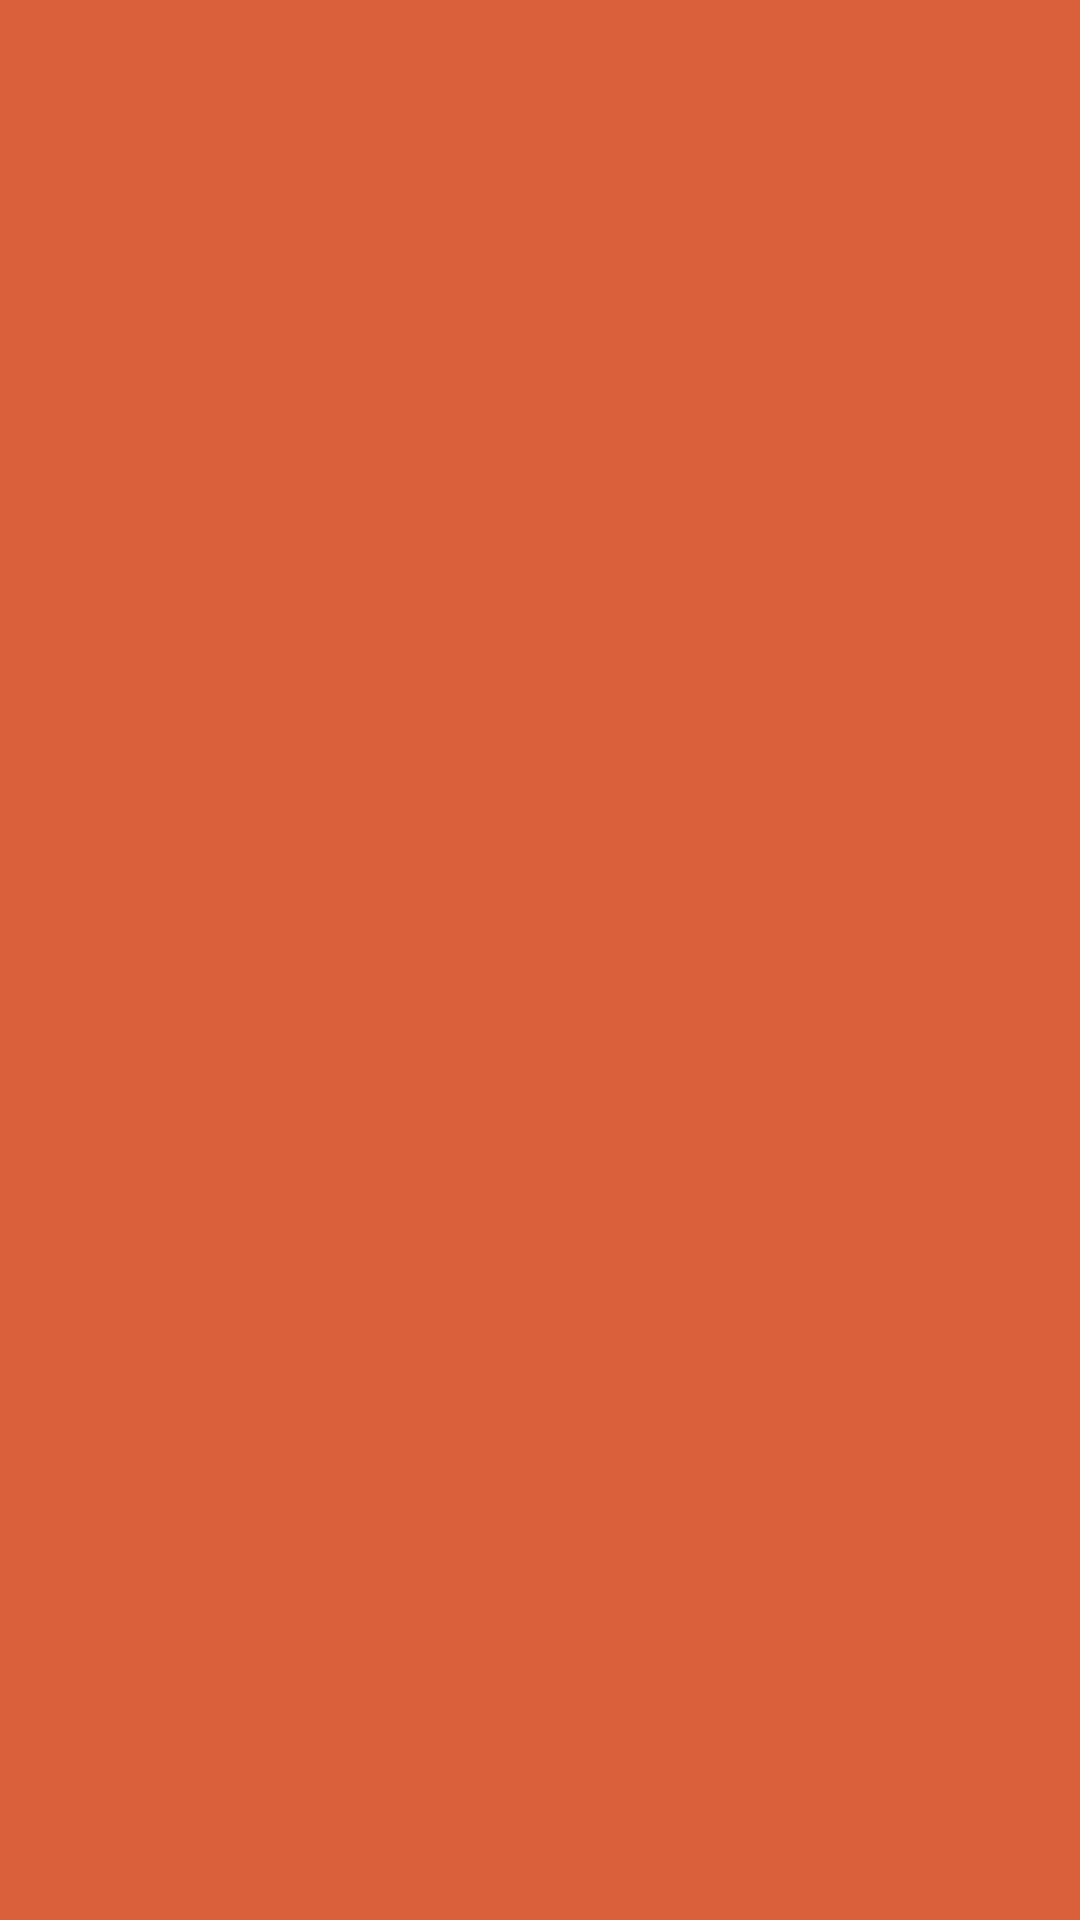 1080x1920 Medium Vermilion Solid Color Background